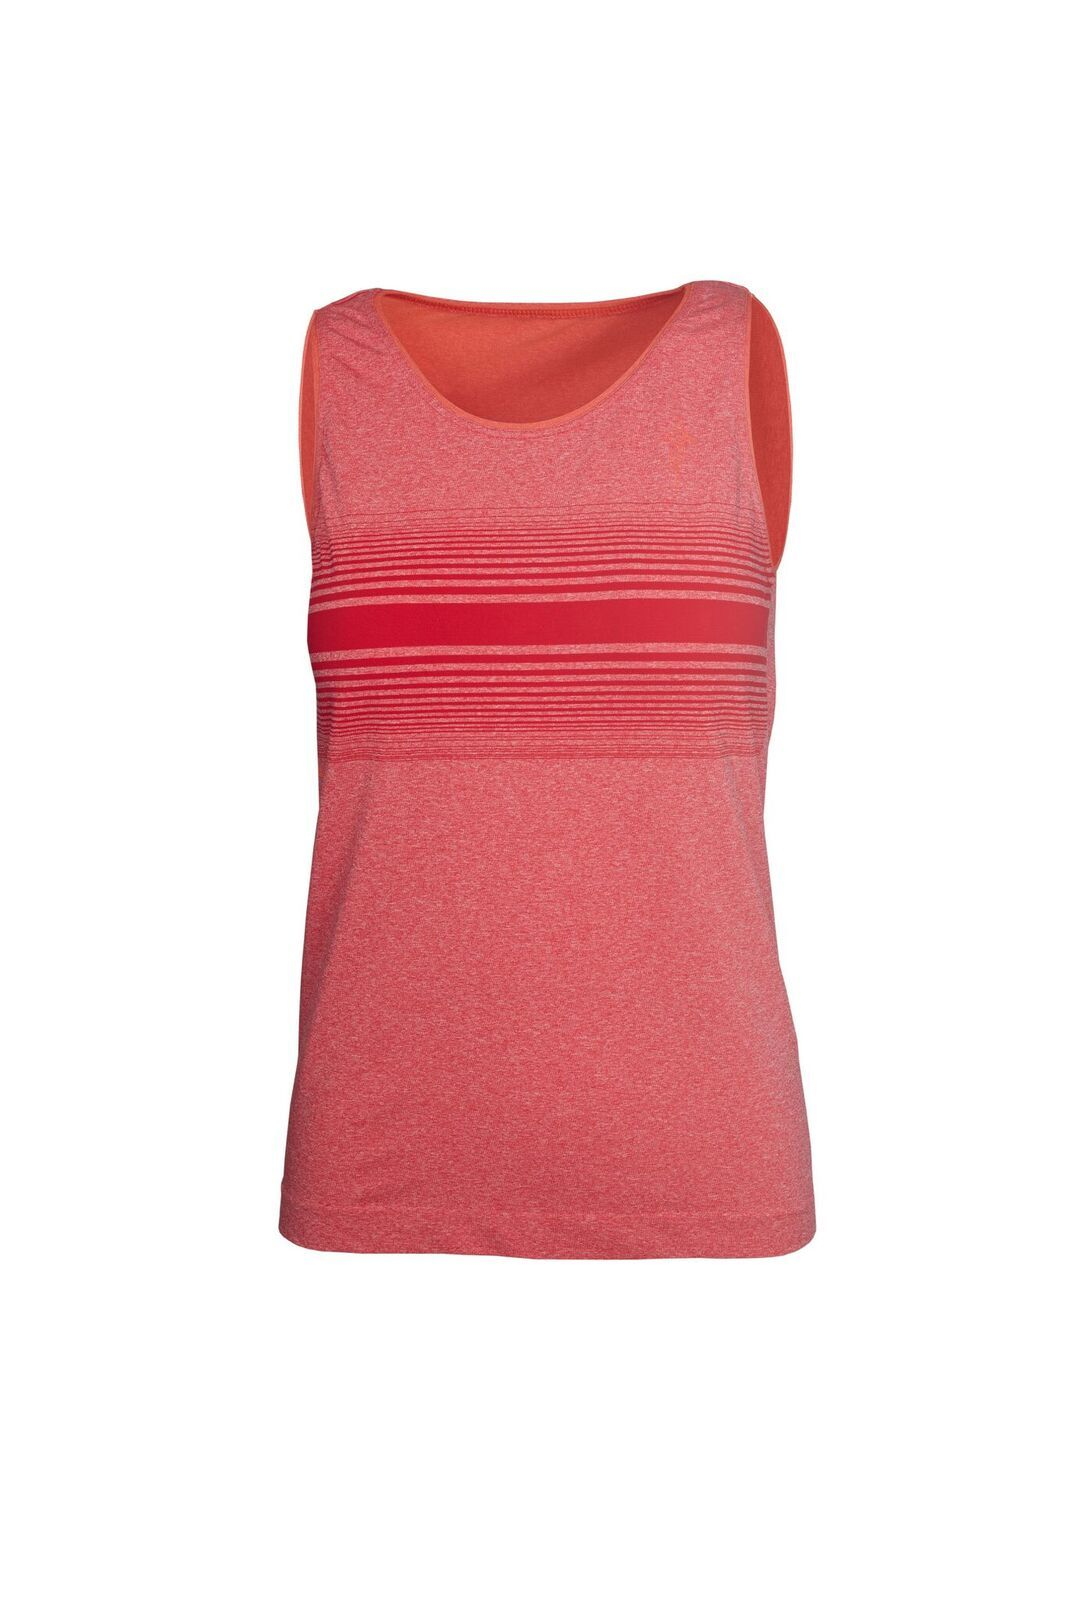 Thonimara Damen Sommer OA Shirt Breeze in Rot